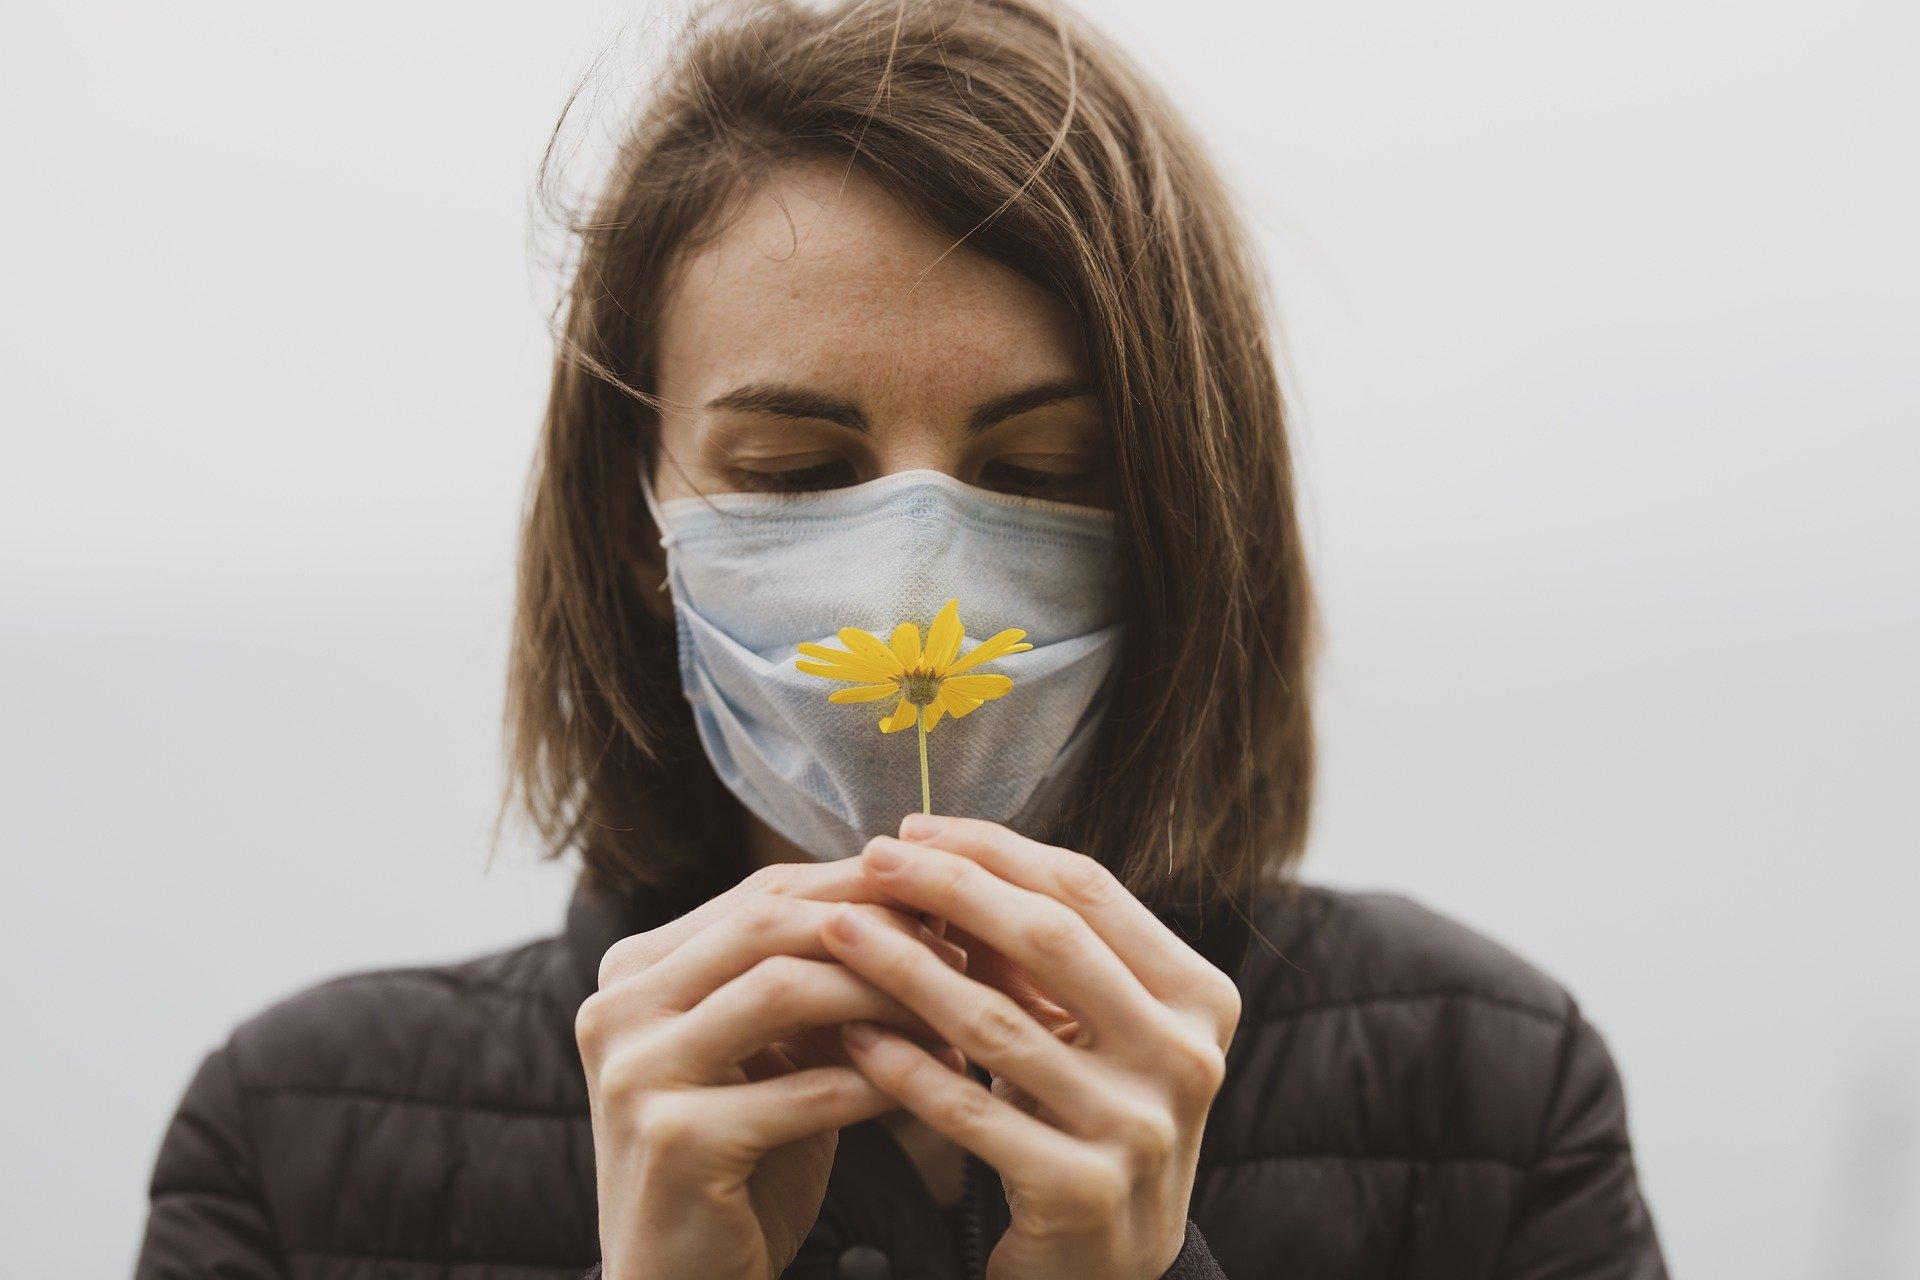 Perte odorat anosmie hyposmie covid coronavirus